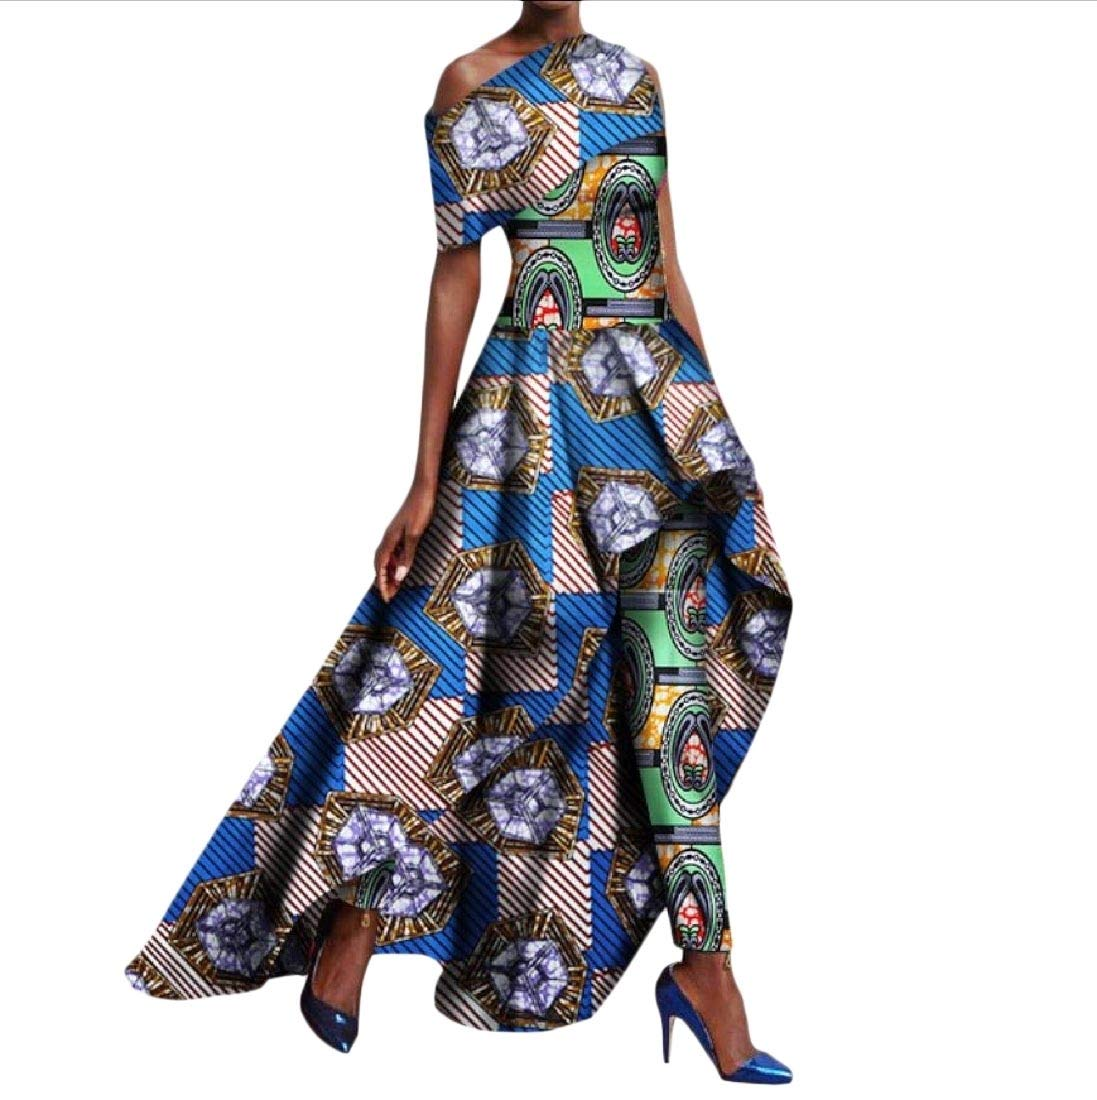 Winwinus Women's 2pcs Set Africa Pants Fit Dashiki Printing Party Long Dress 2 6XL